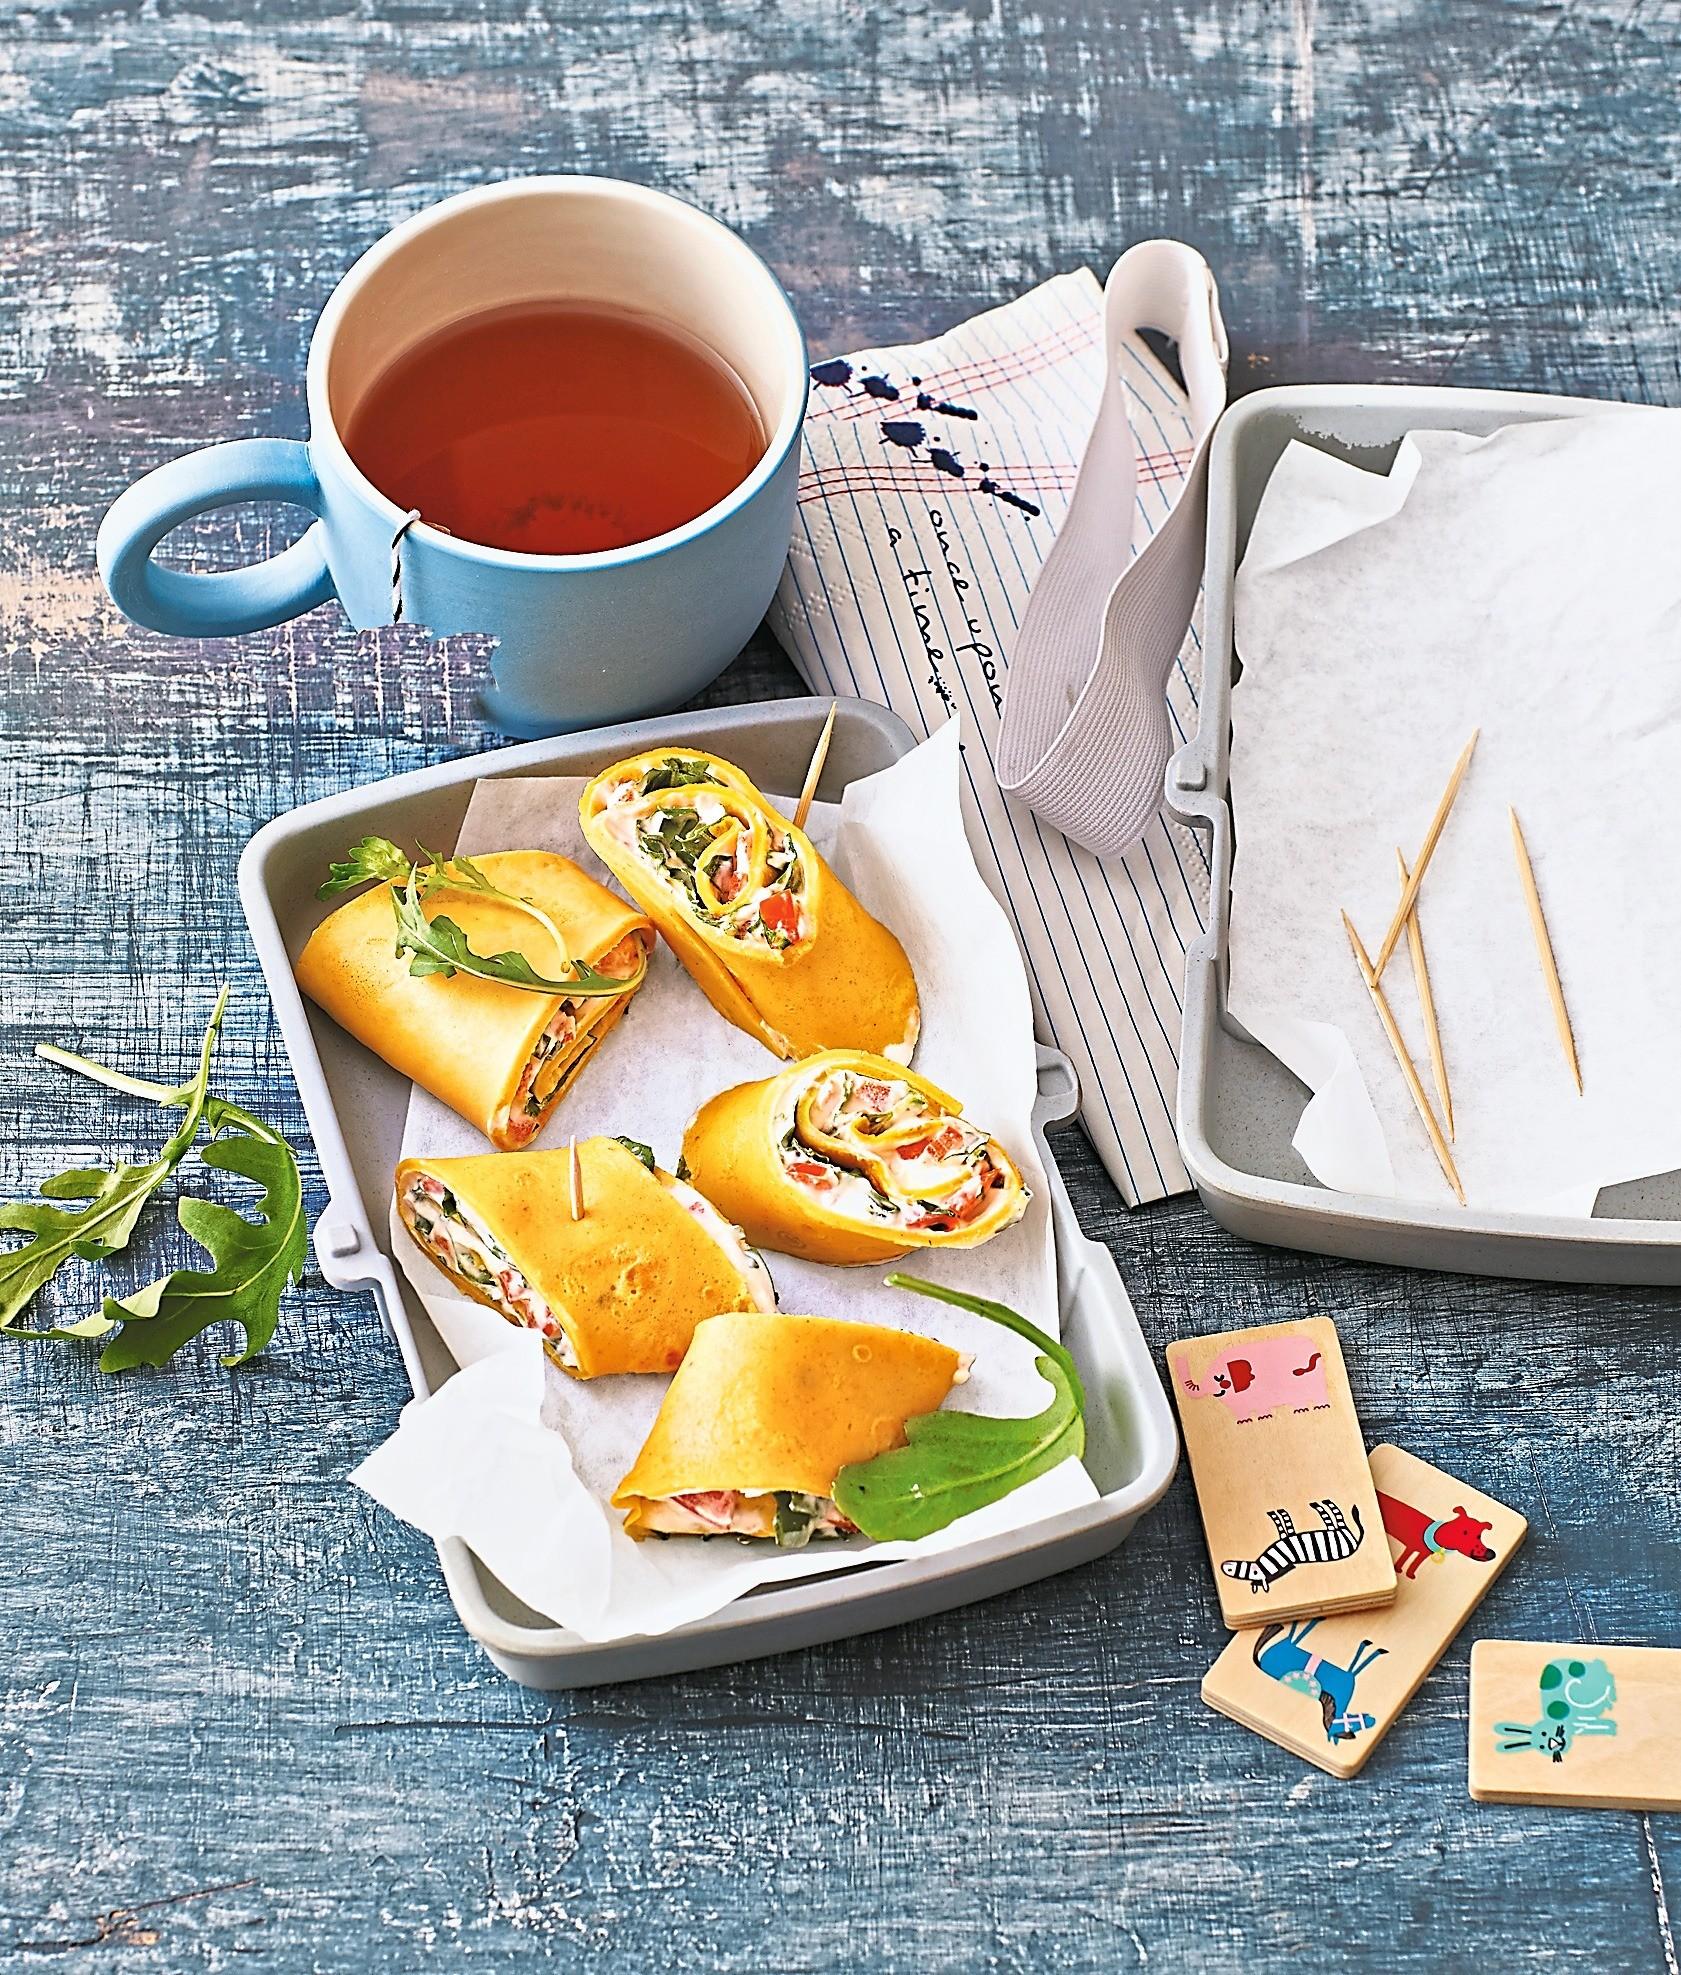 Обед на бегу: рецепт роллов с сыром